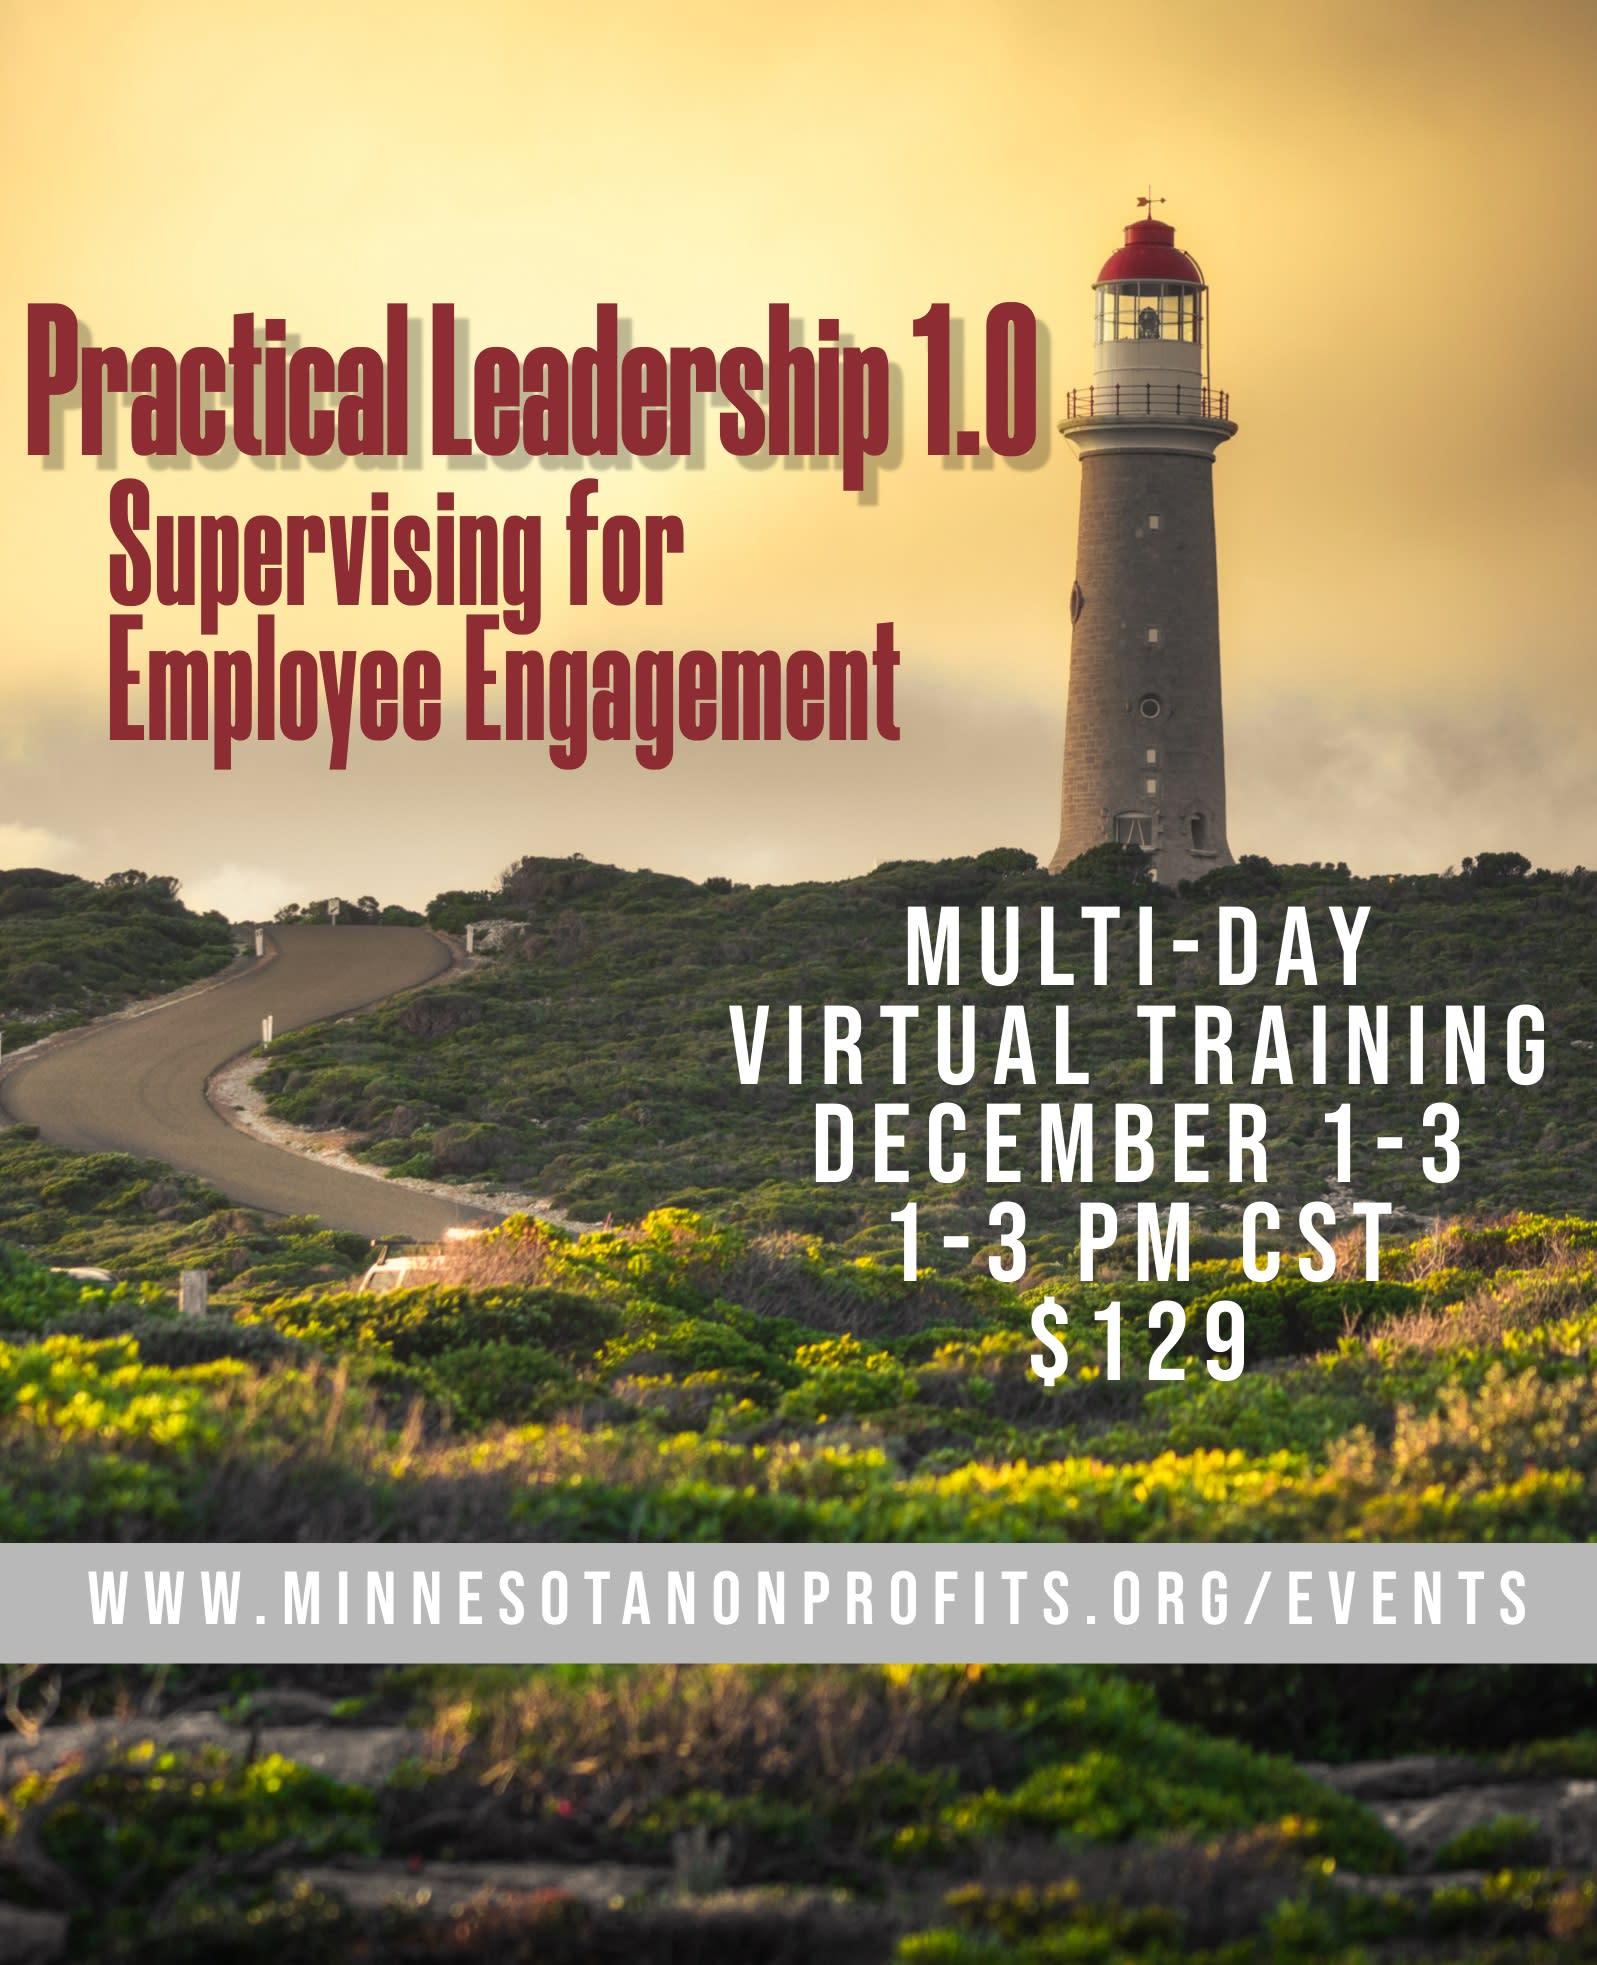 Practical Leadership 1.0 Training Flyer